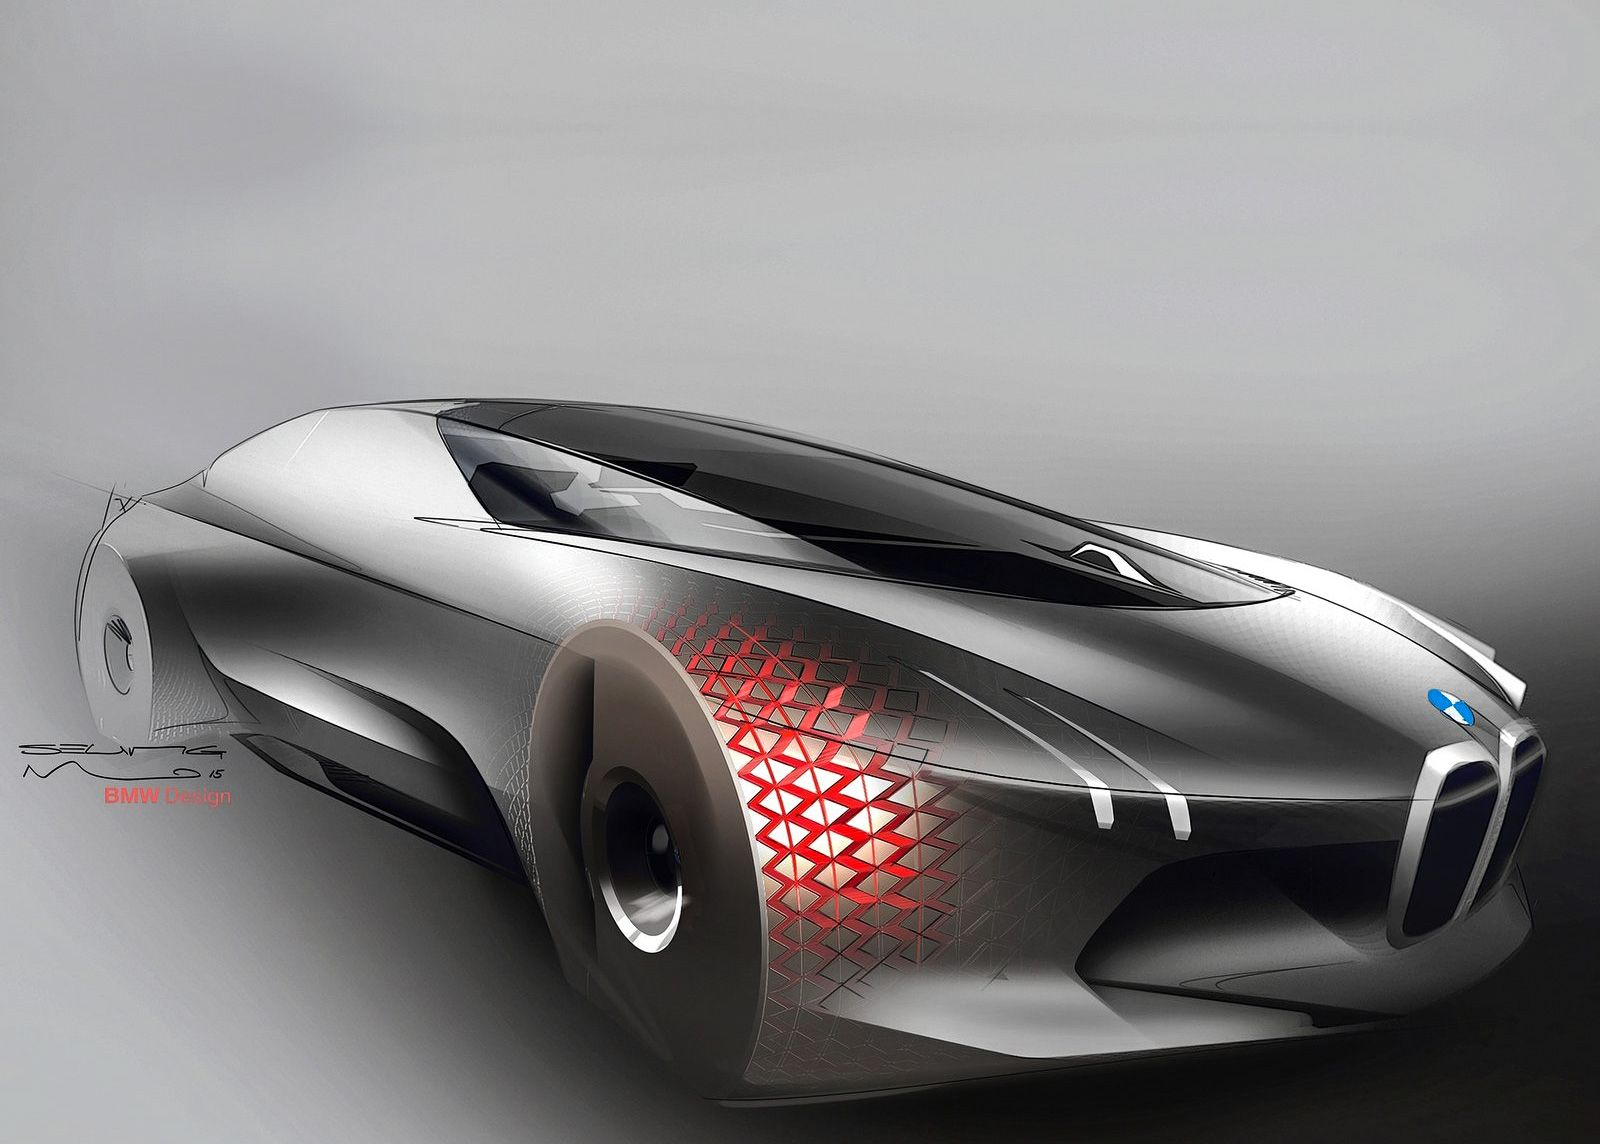 new car bmw vision next 100 concept car design news car sketch pinterest bmw cars. Black Bedroom Furniture Sets. Home Design Ideas